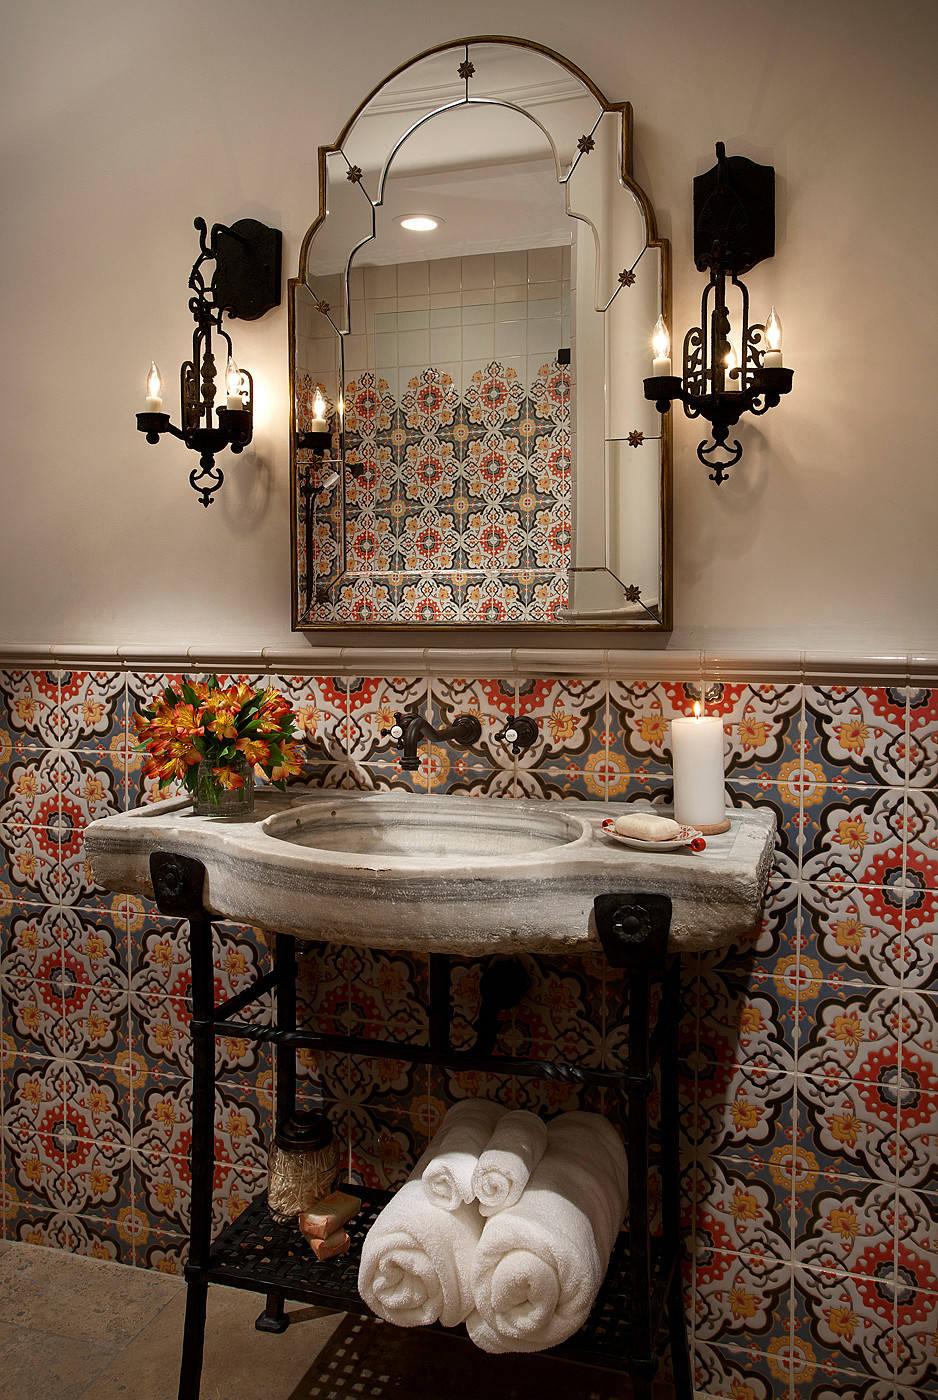 luxury bathroom faucets - longevive